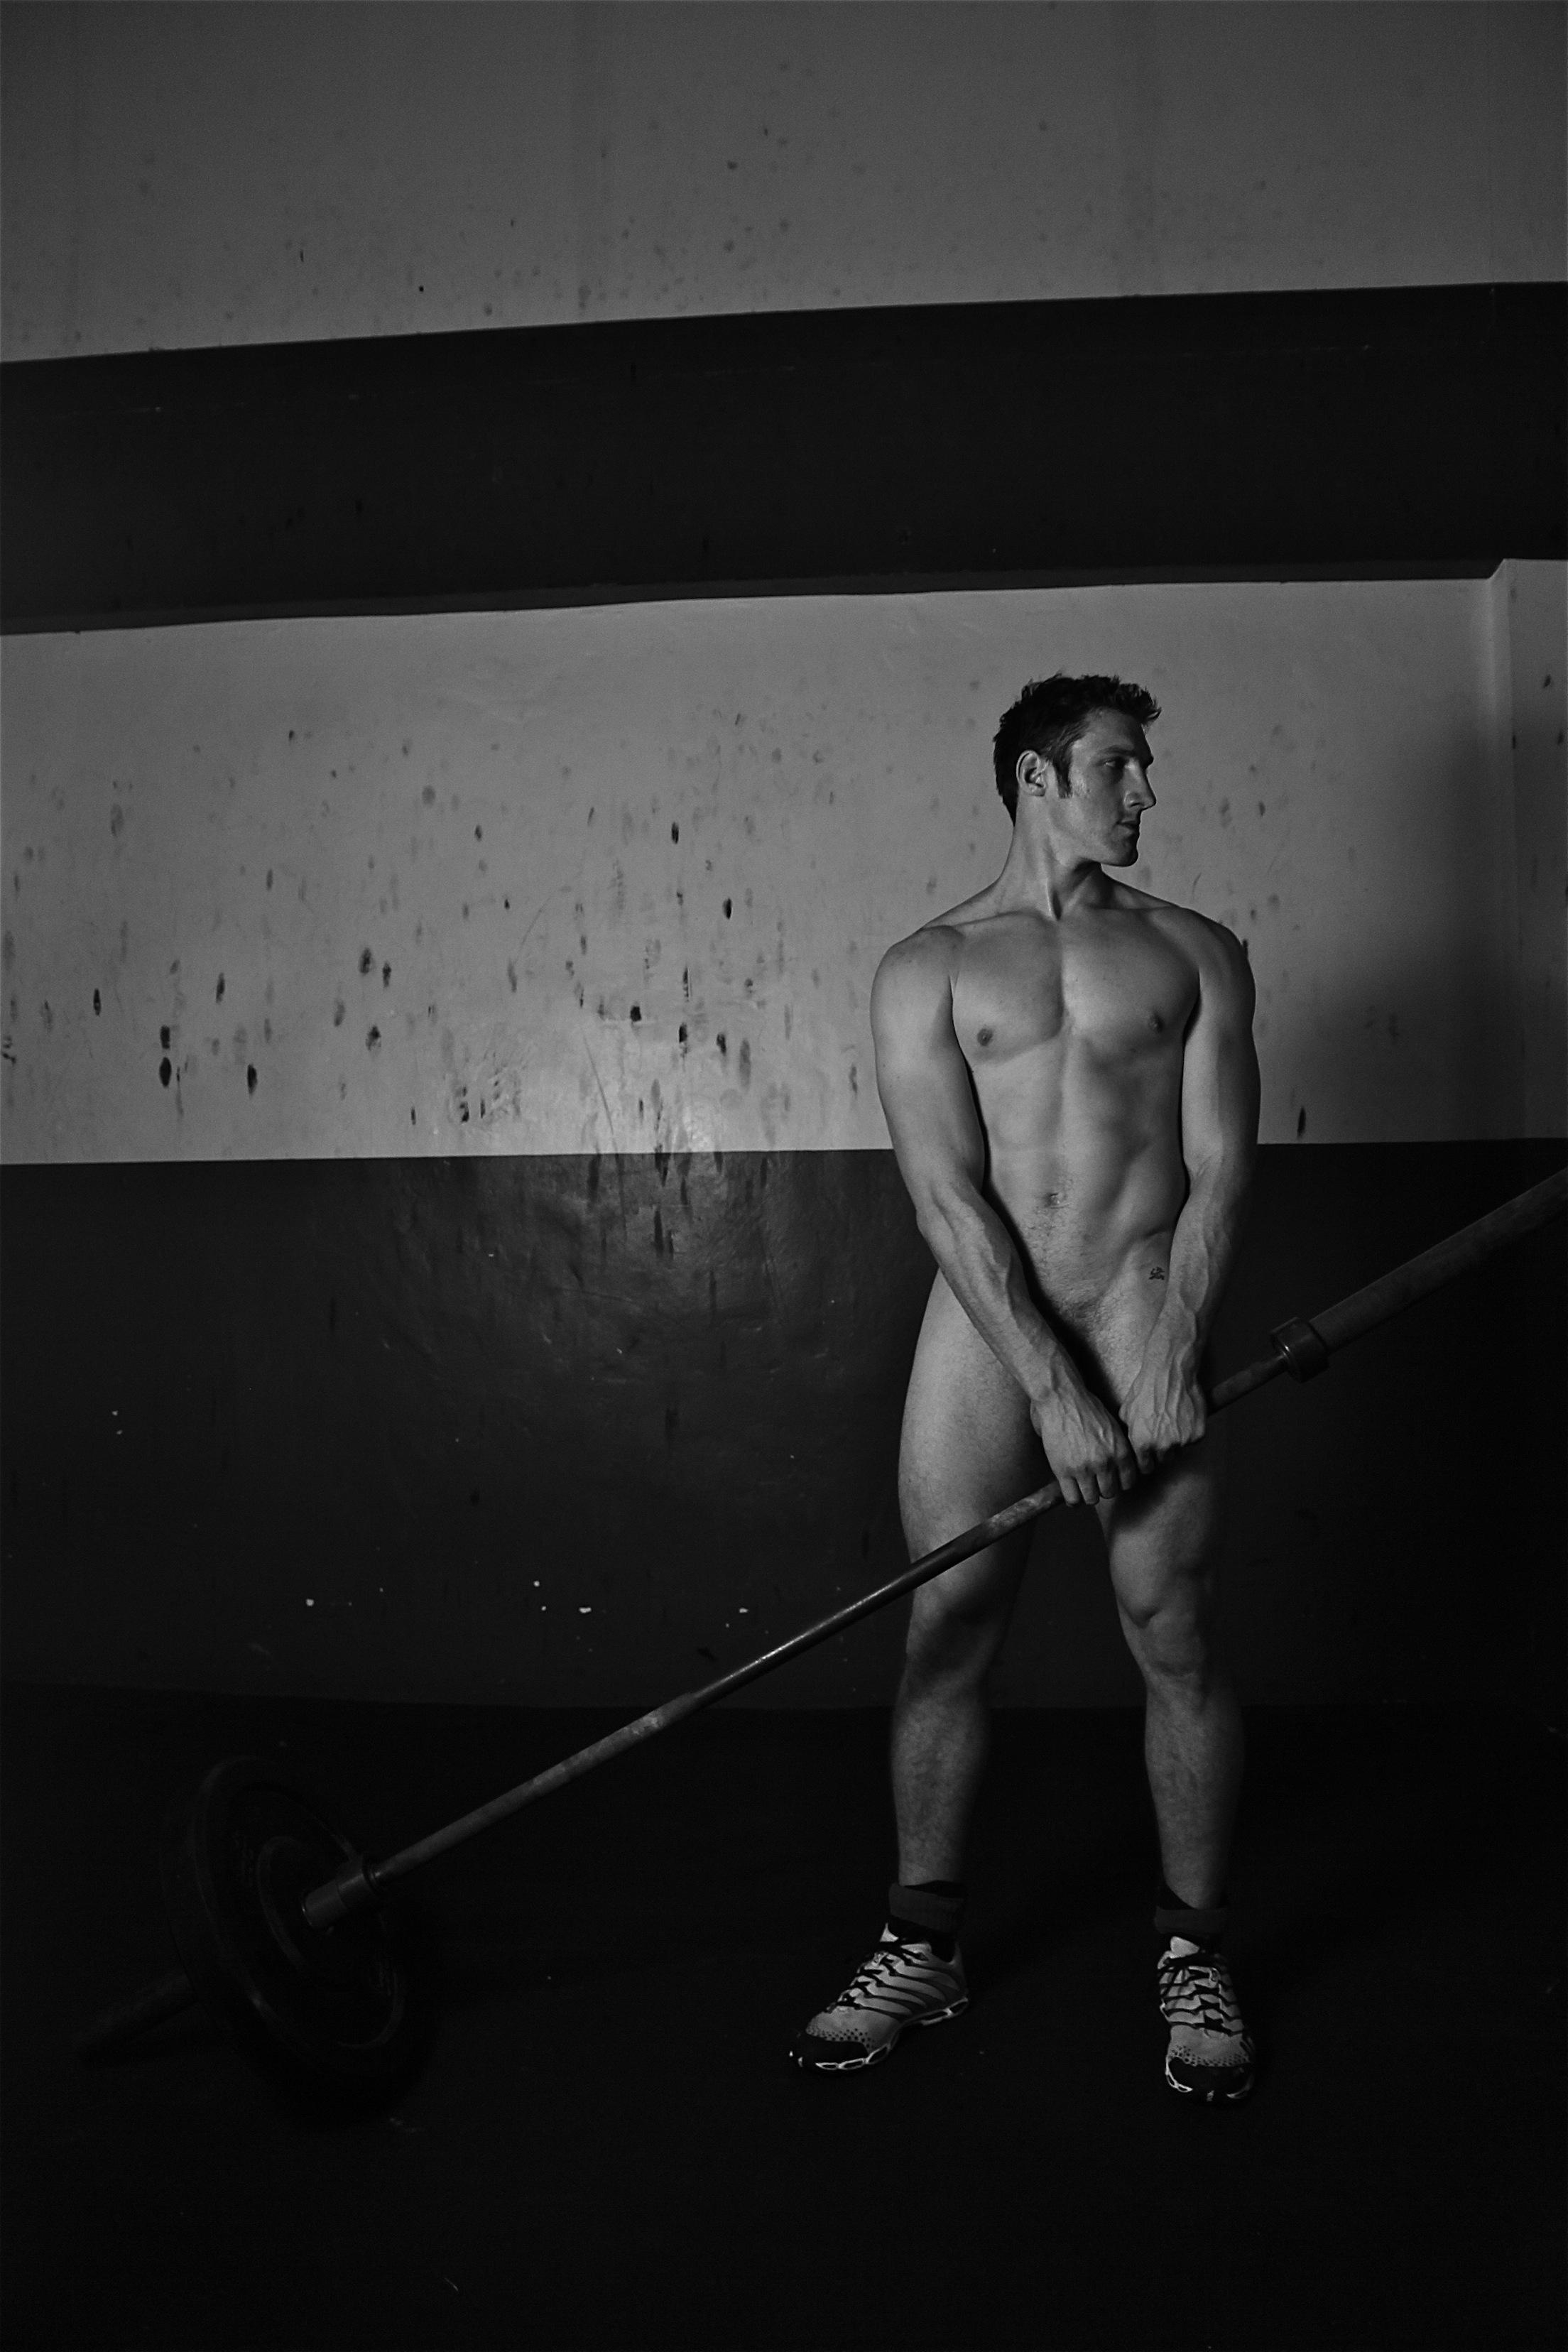 Mr naked pole vaulting man